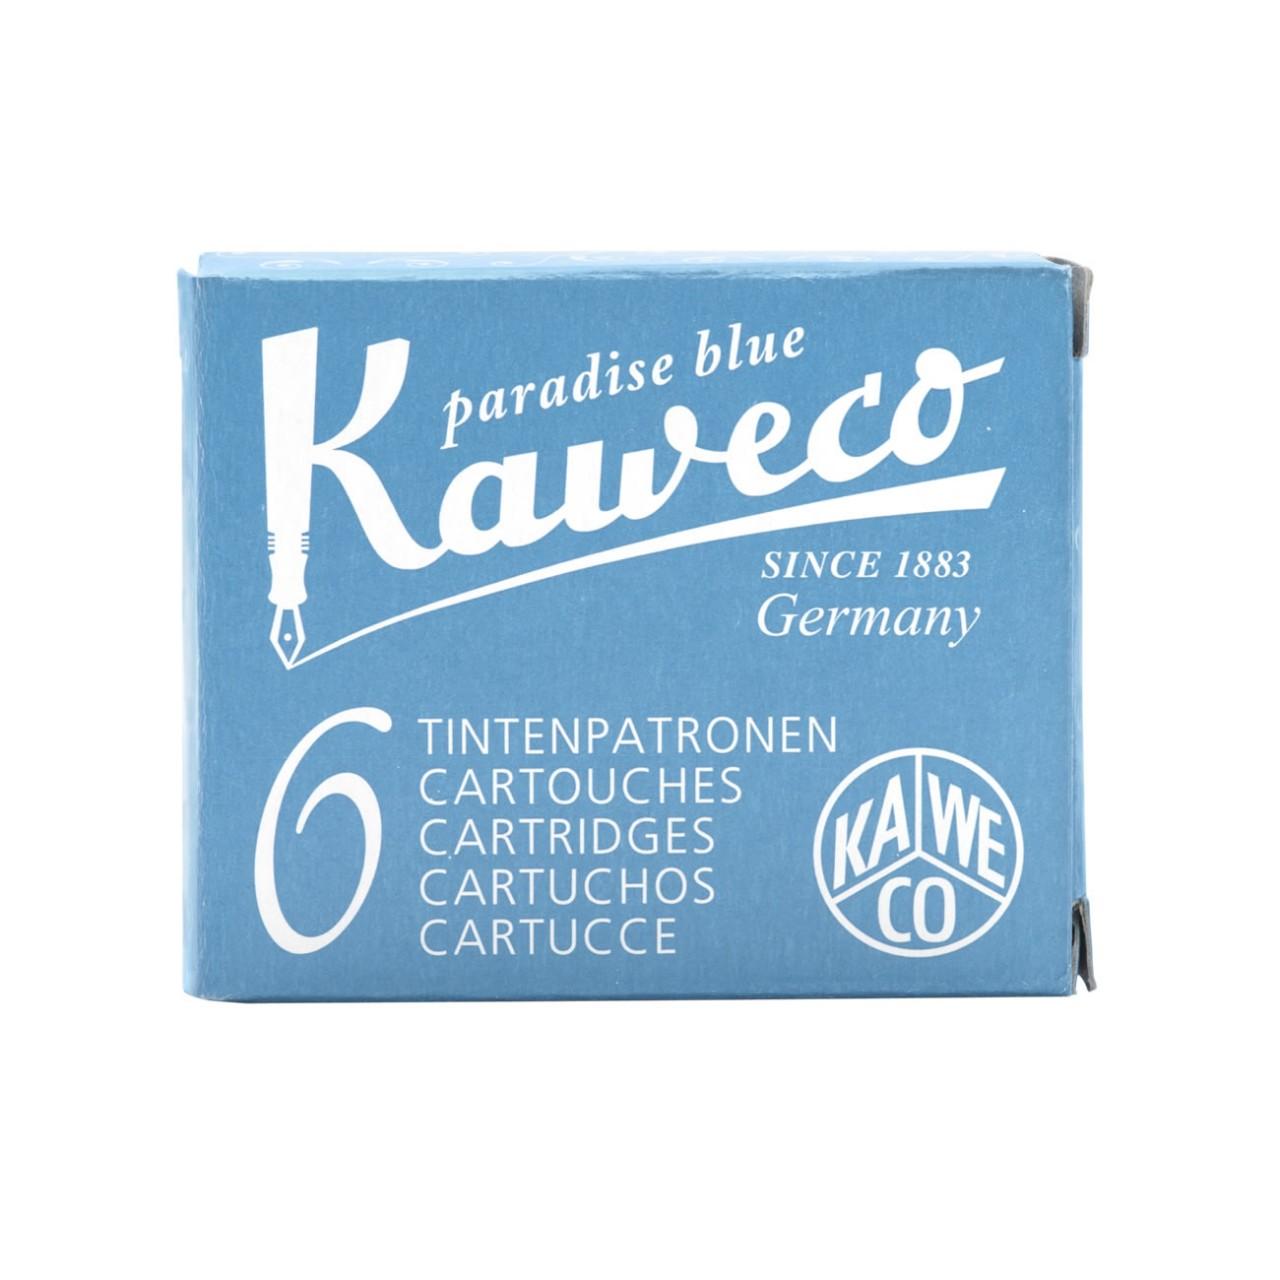 Kaweco Tintenpatronen 6 Stück paradiesblau VE=20 Pack